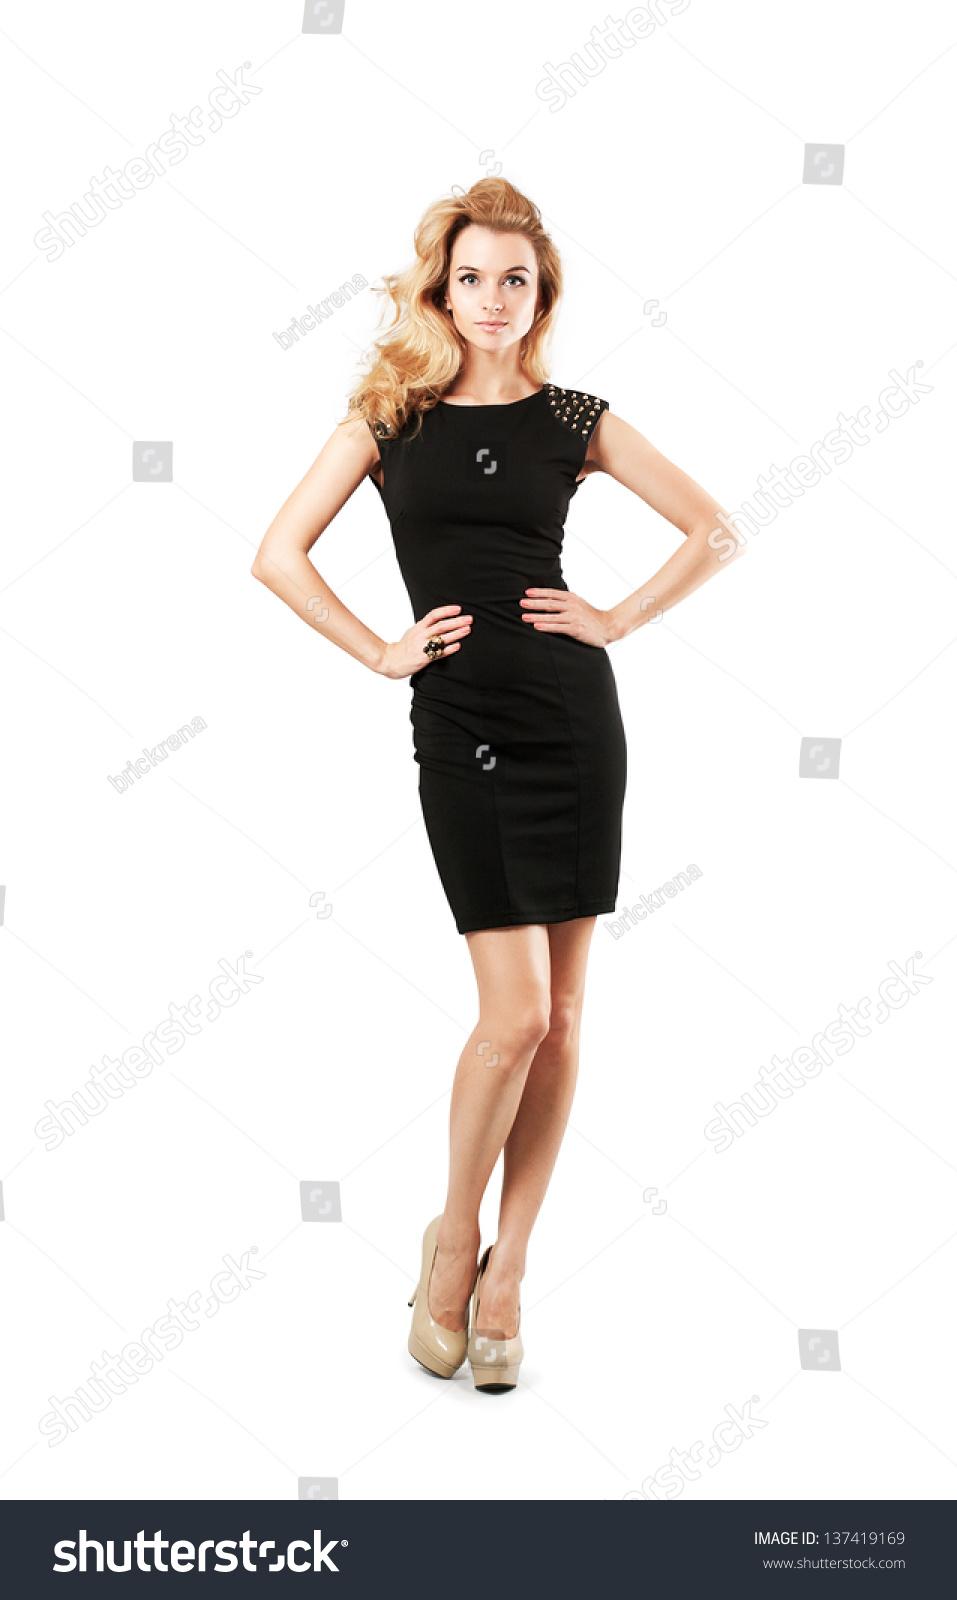 won't Busty blonde milf black lingerie partner should funny,loving,has